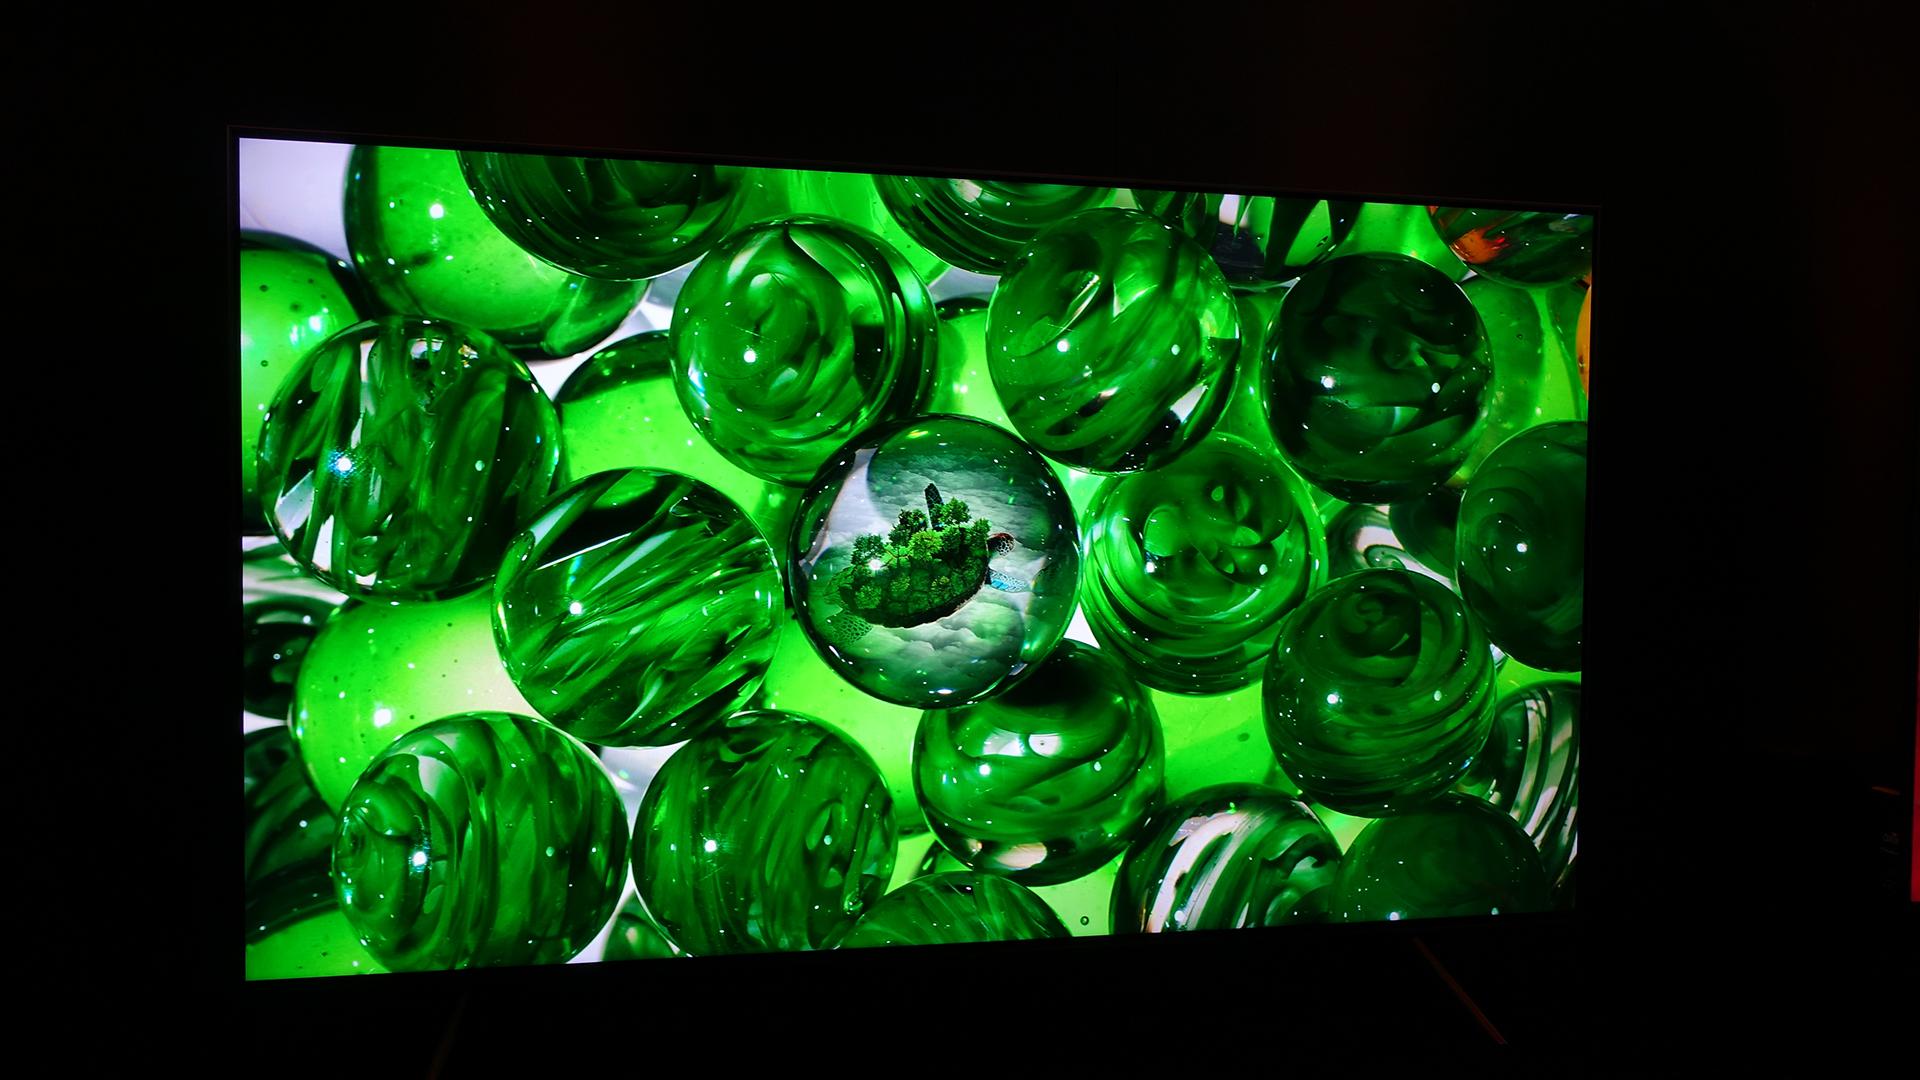 technologies: Samsung Q8FN QLED TV (QN65Q8FN)